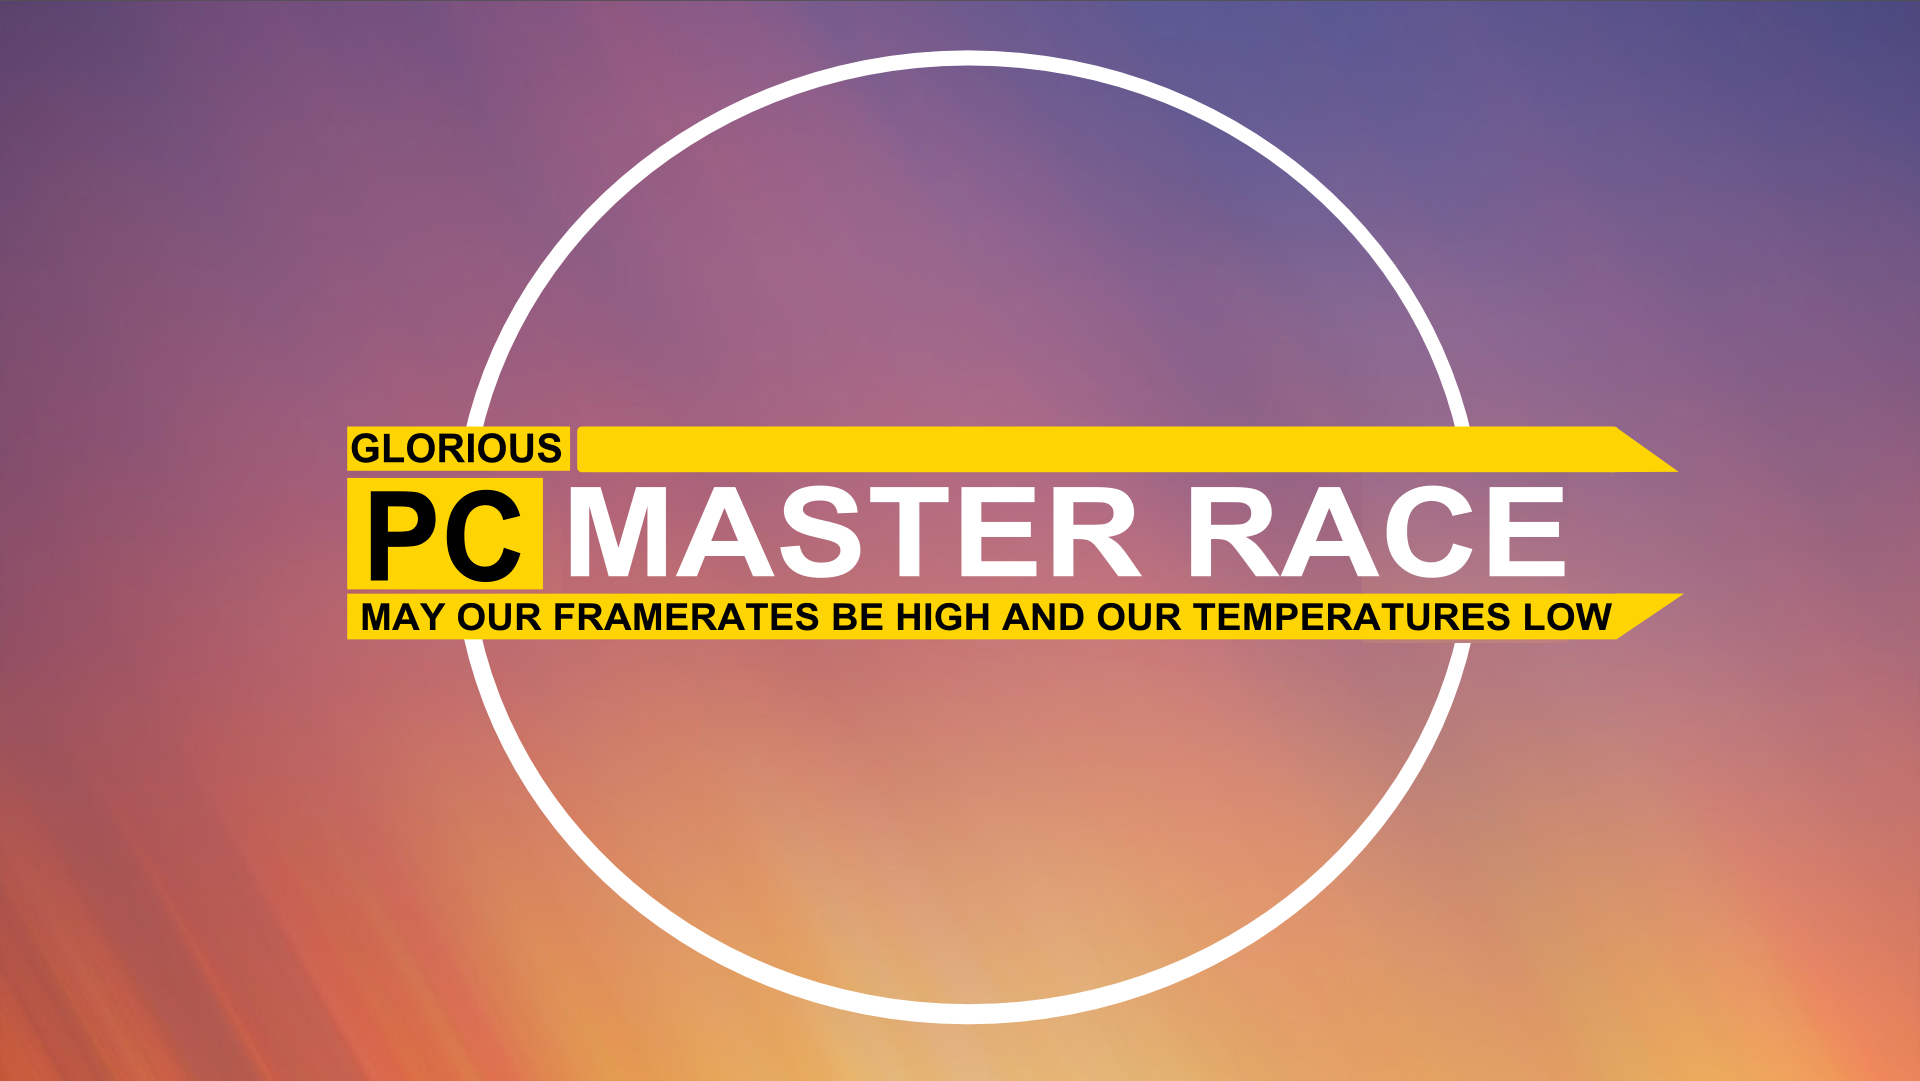 pc master race computer wallpapers desktop backgrounds